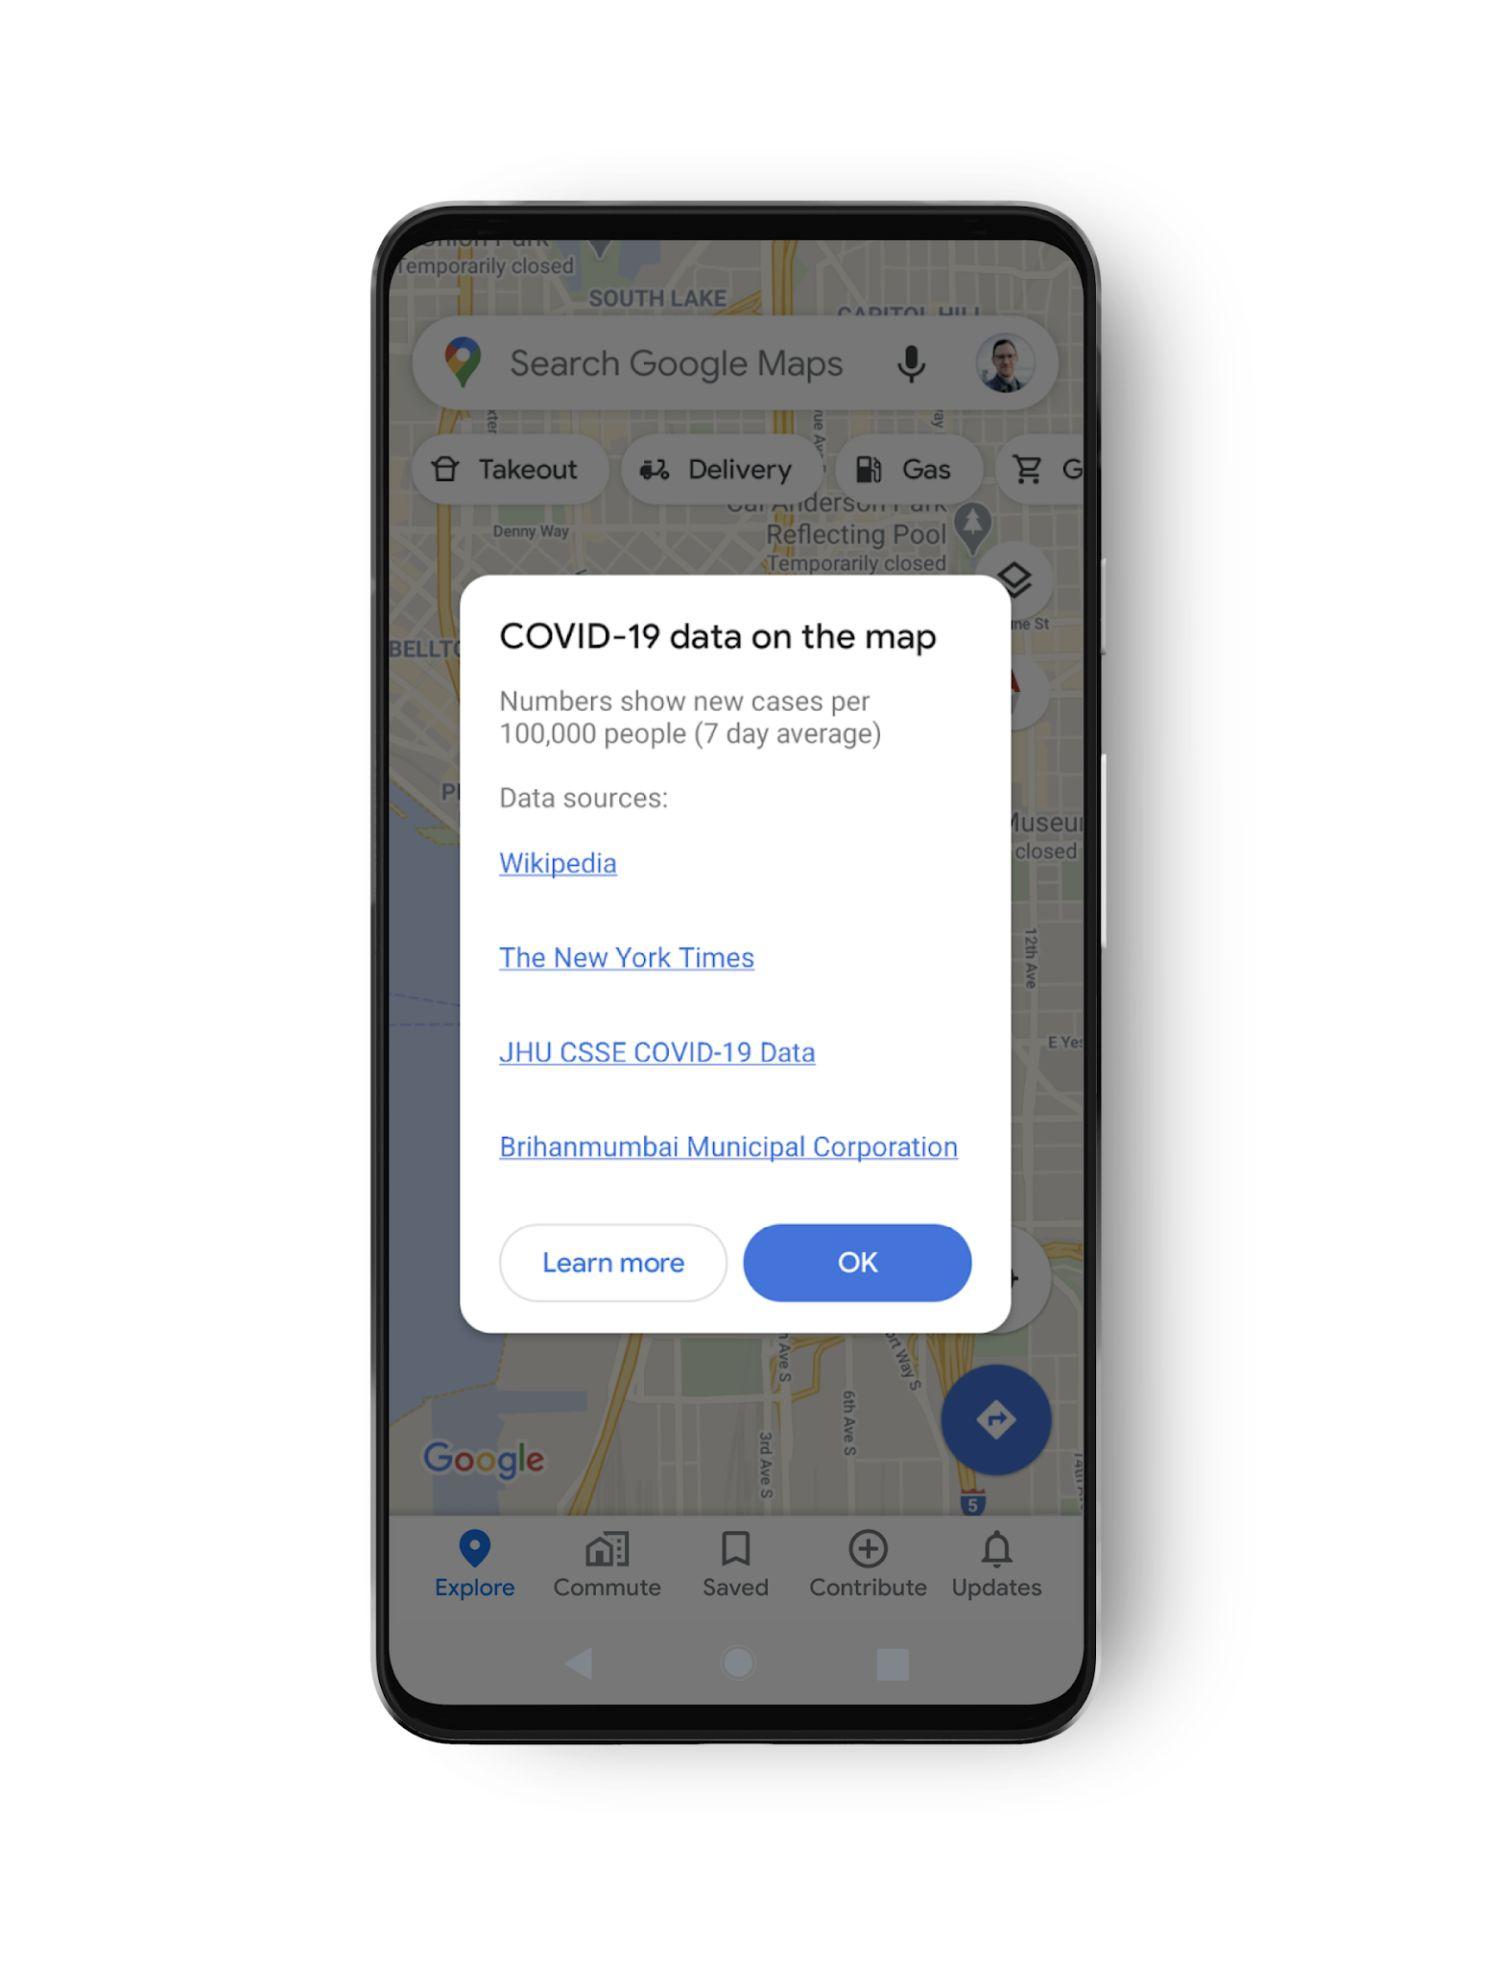 google maps covid 19 data